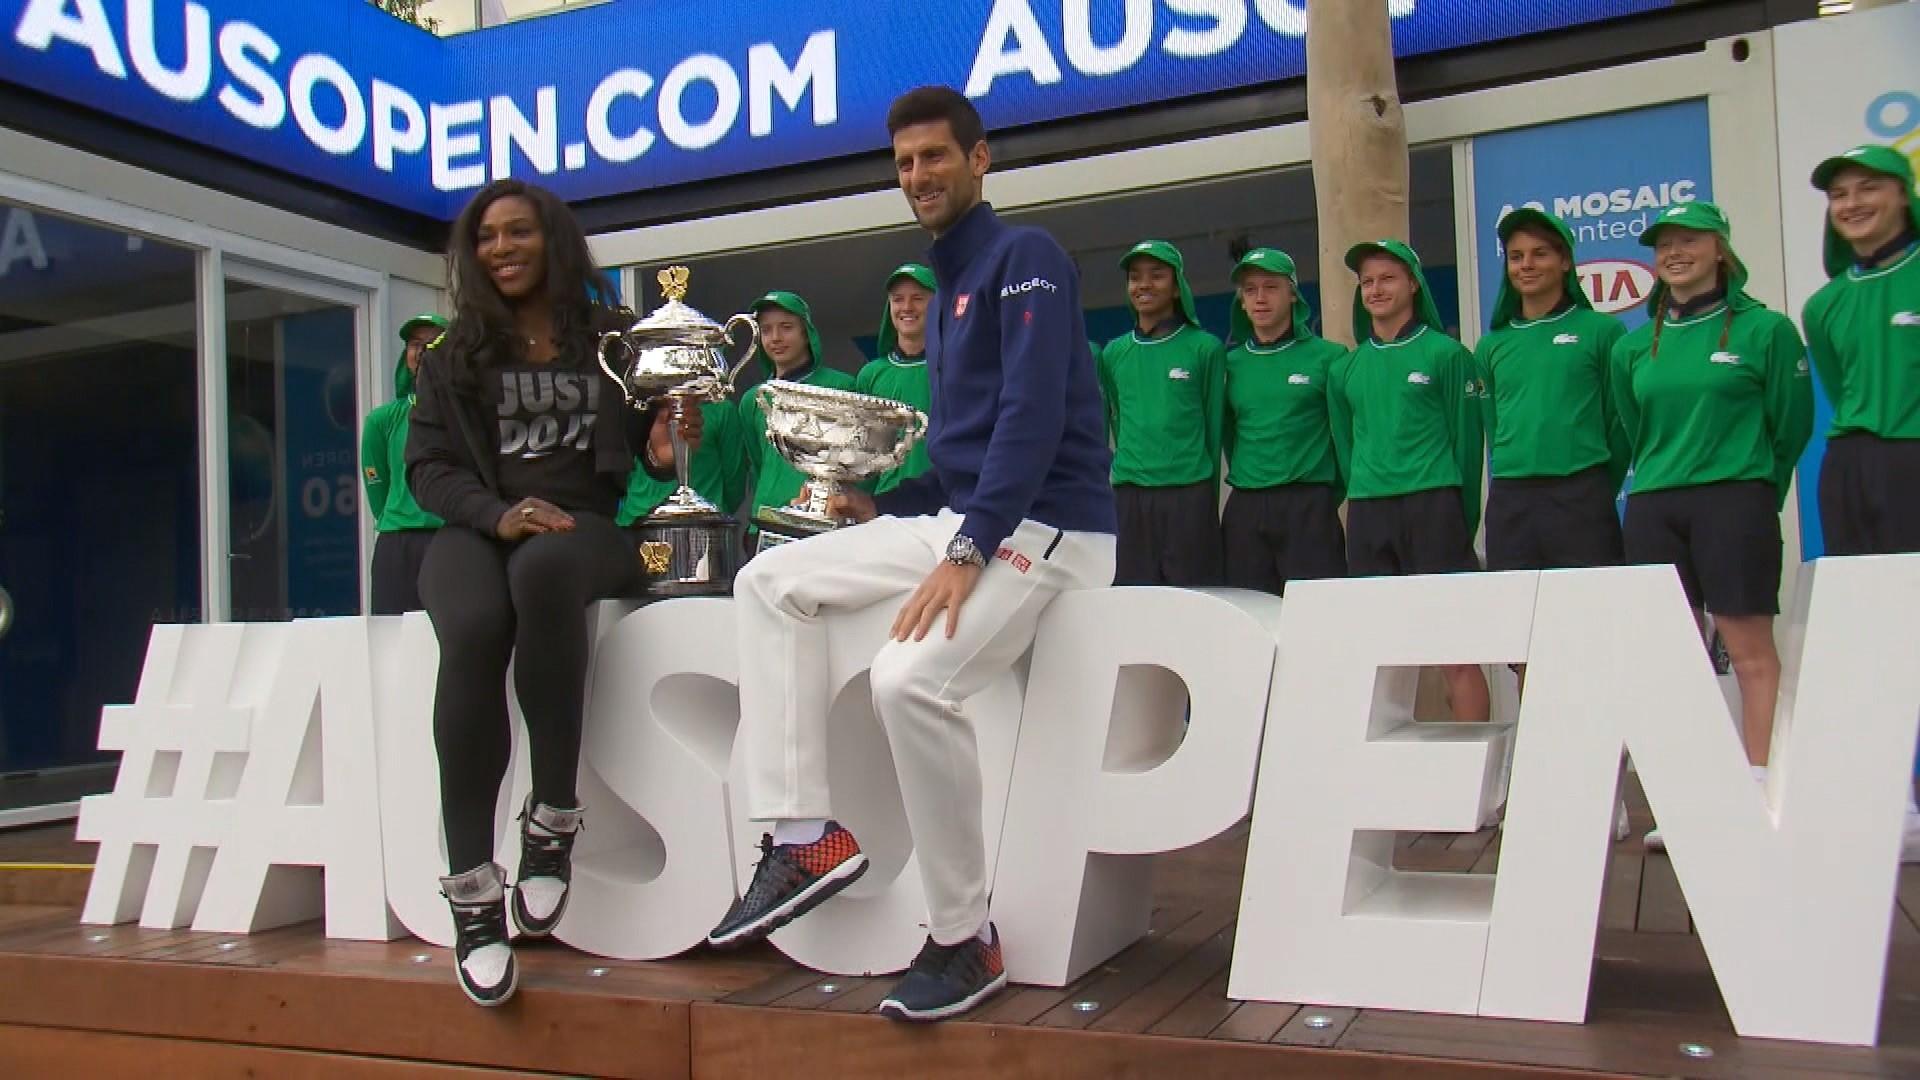 Серена Уильямс, Новак Джокович: жеребьевка Australian Open-2016